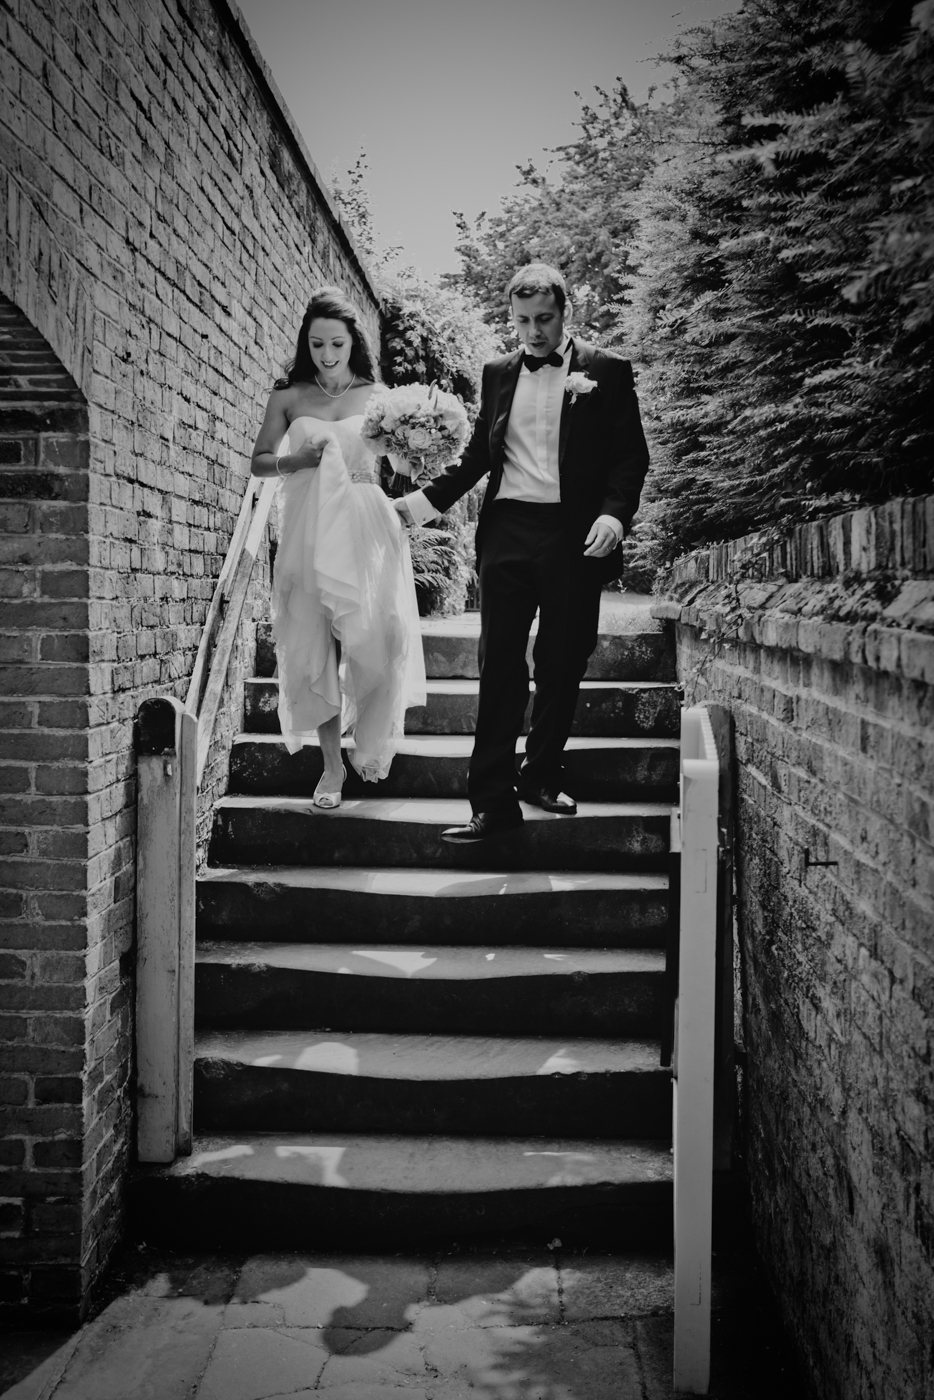 106 - Abi and Chris at Kedleston Hall - Wedding Photography by Mark Pugh www.markpugh.com - 0393.JPG